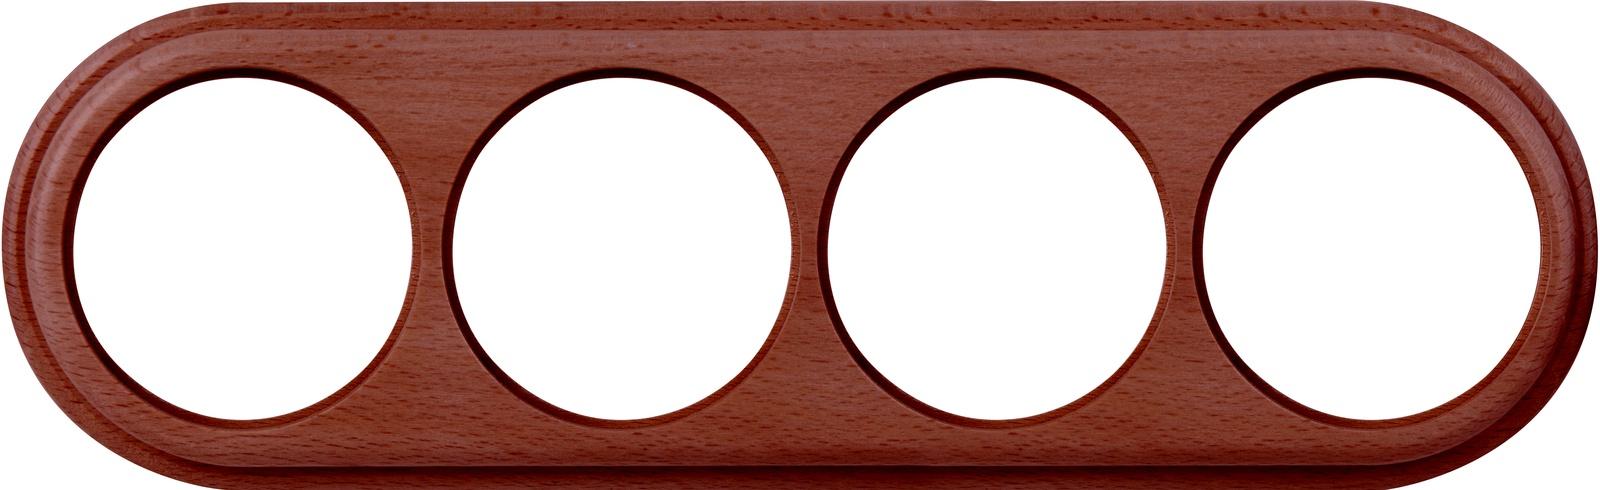 WL15-frame-04  Рамка на 4 поста итальянский орех